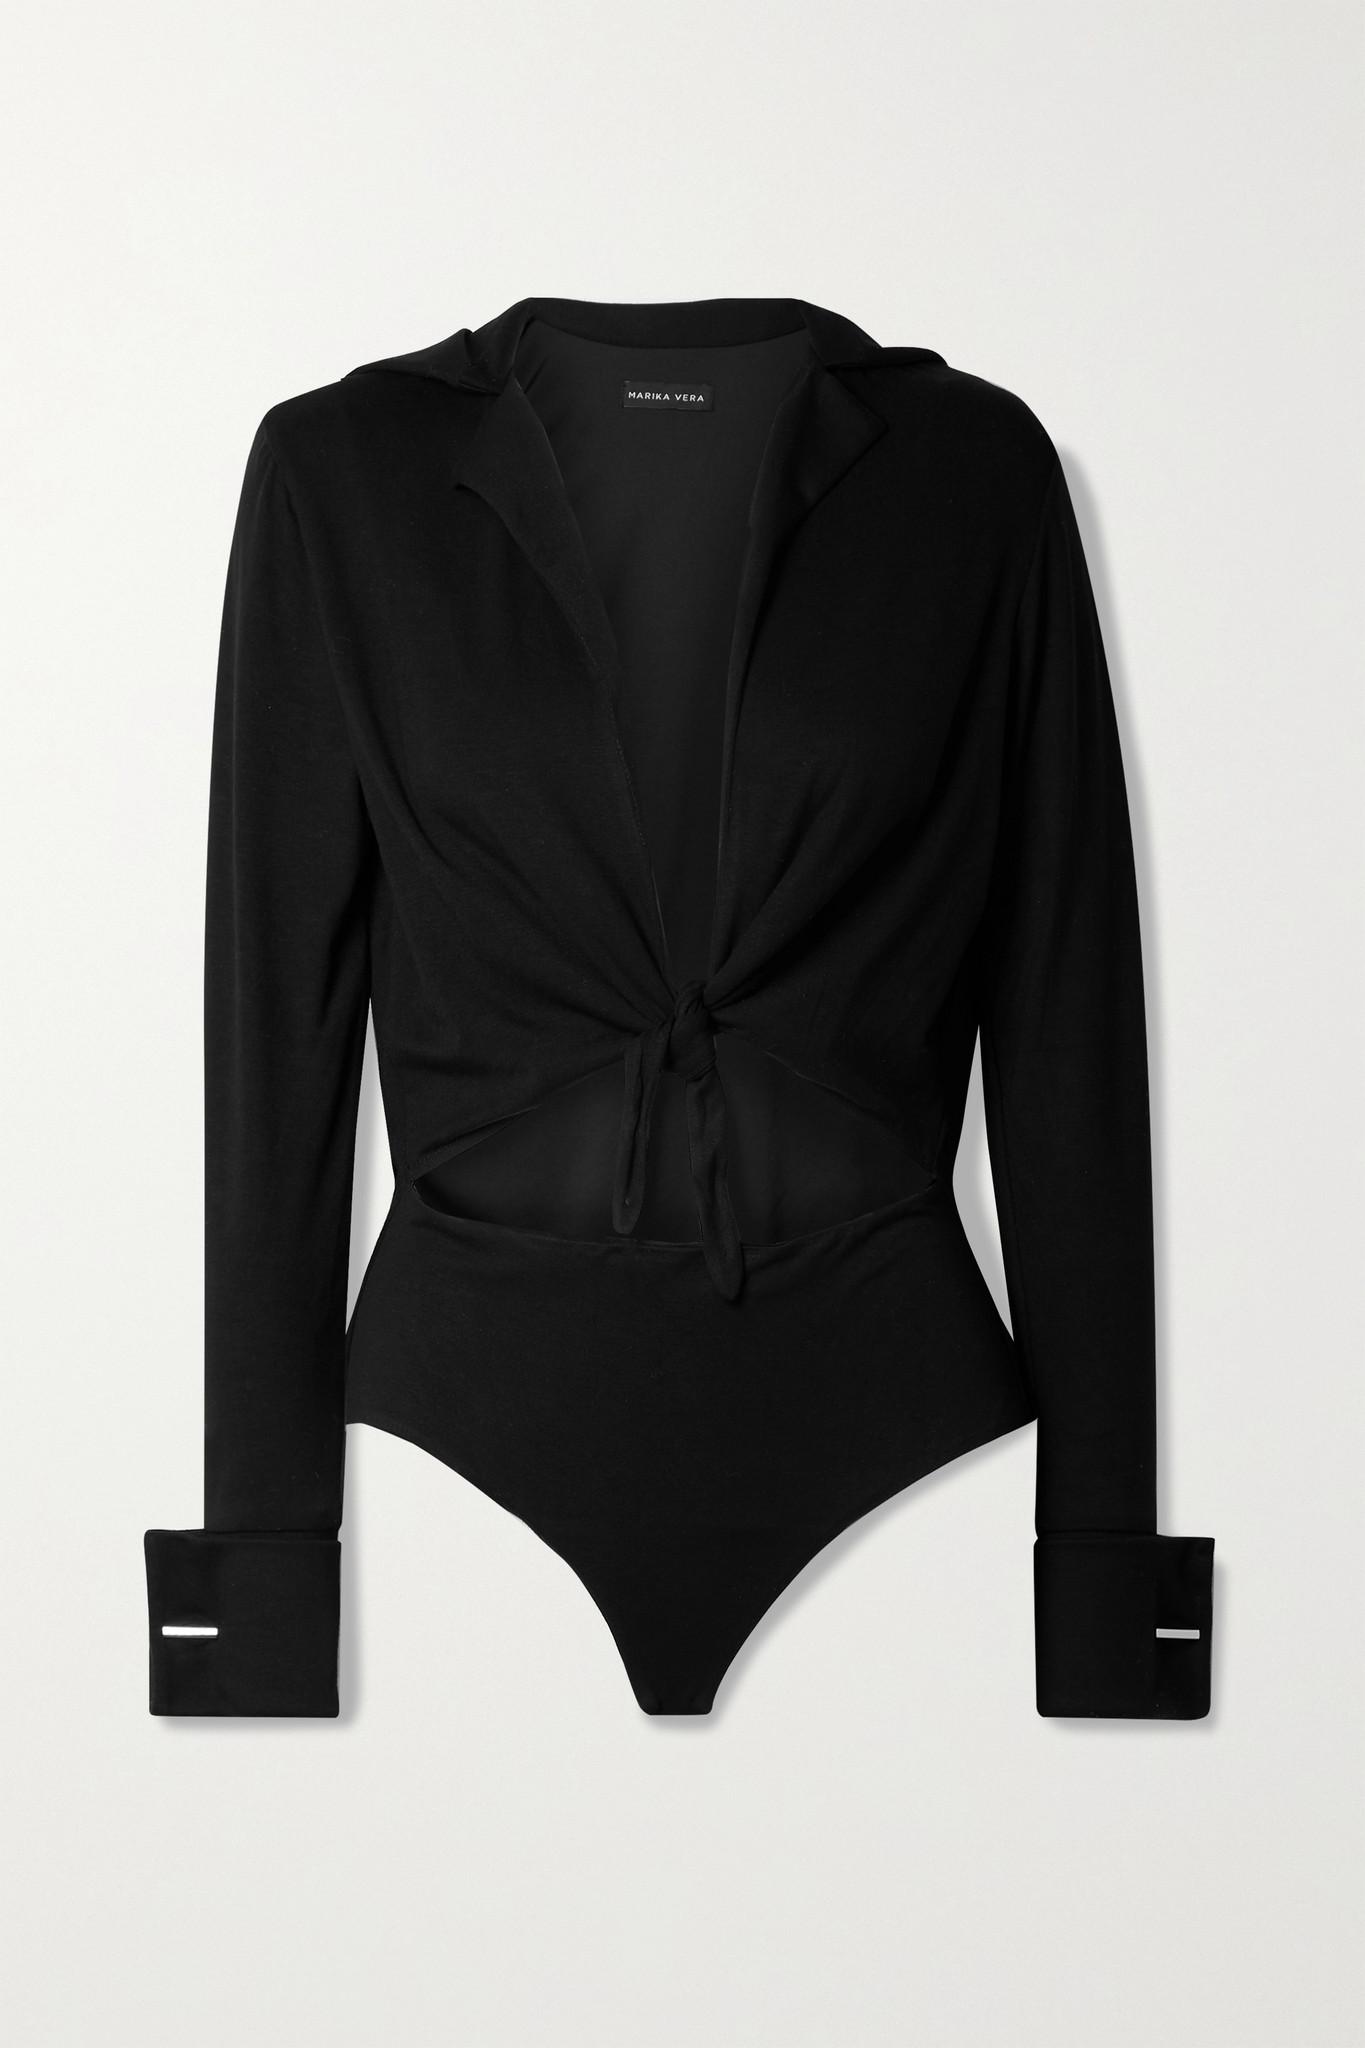 MARIKA VERA - Mirja Tie-front Cutout Stretch-jersey Thong Bodysuit - Black - large